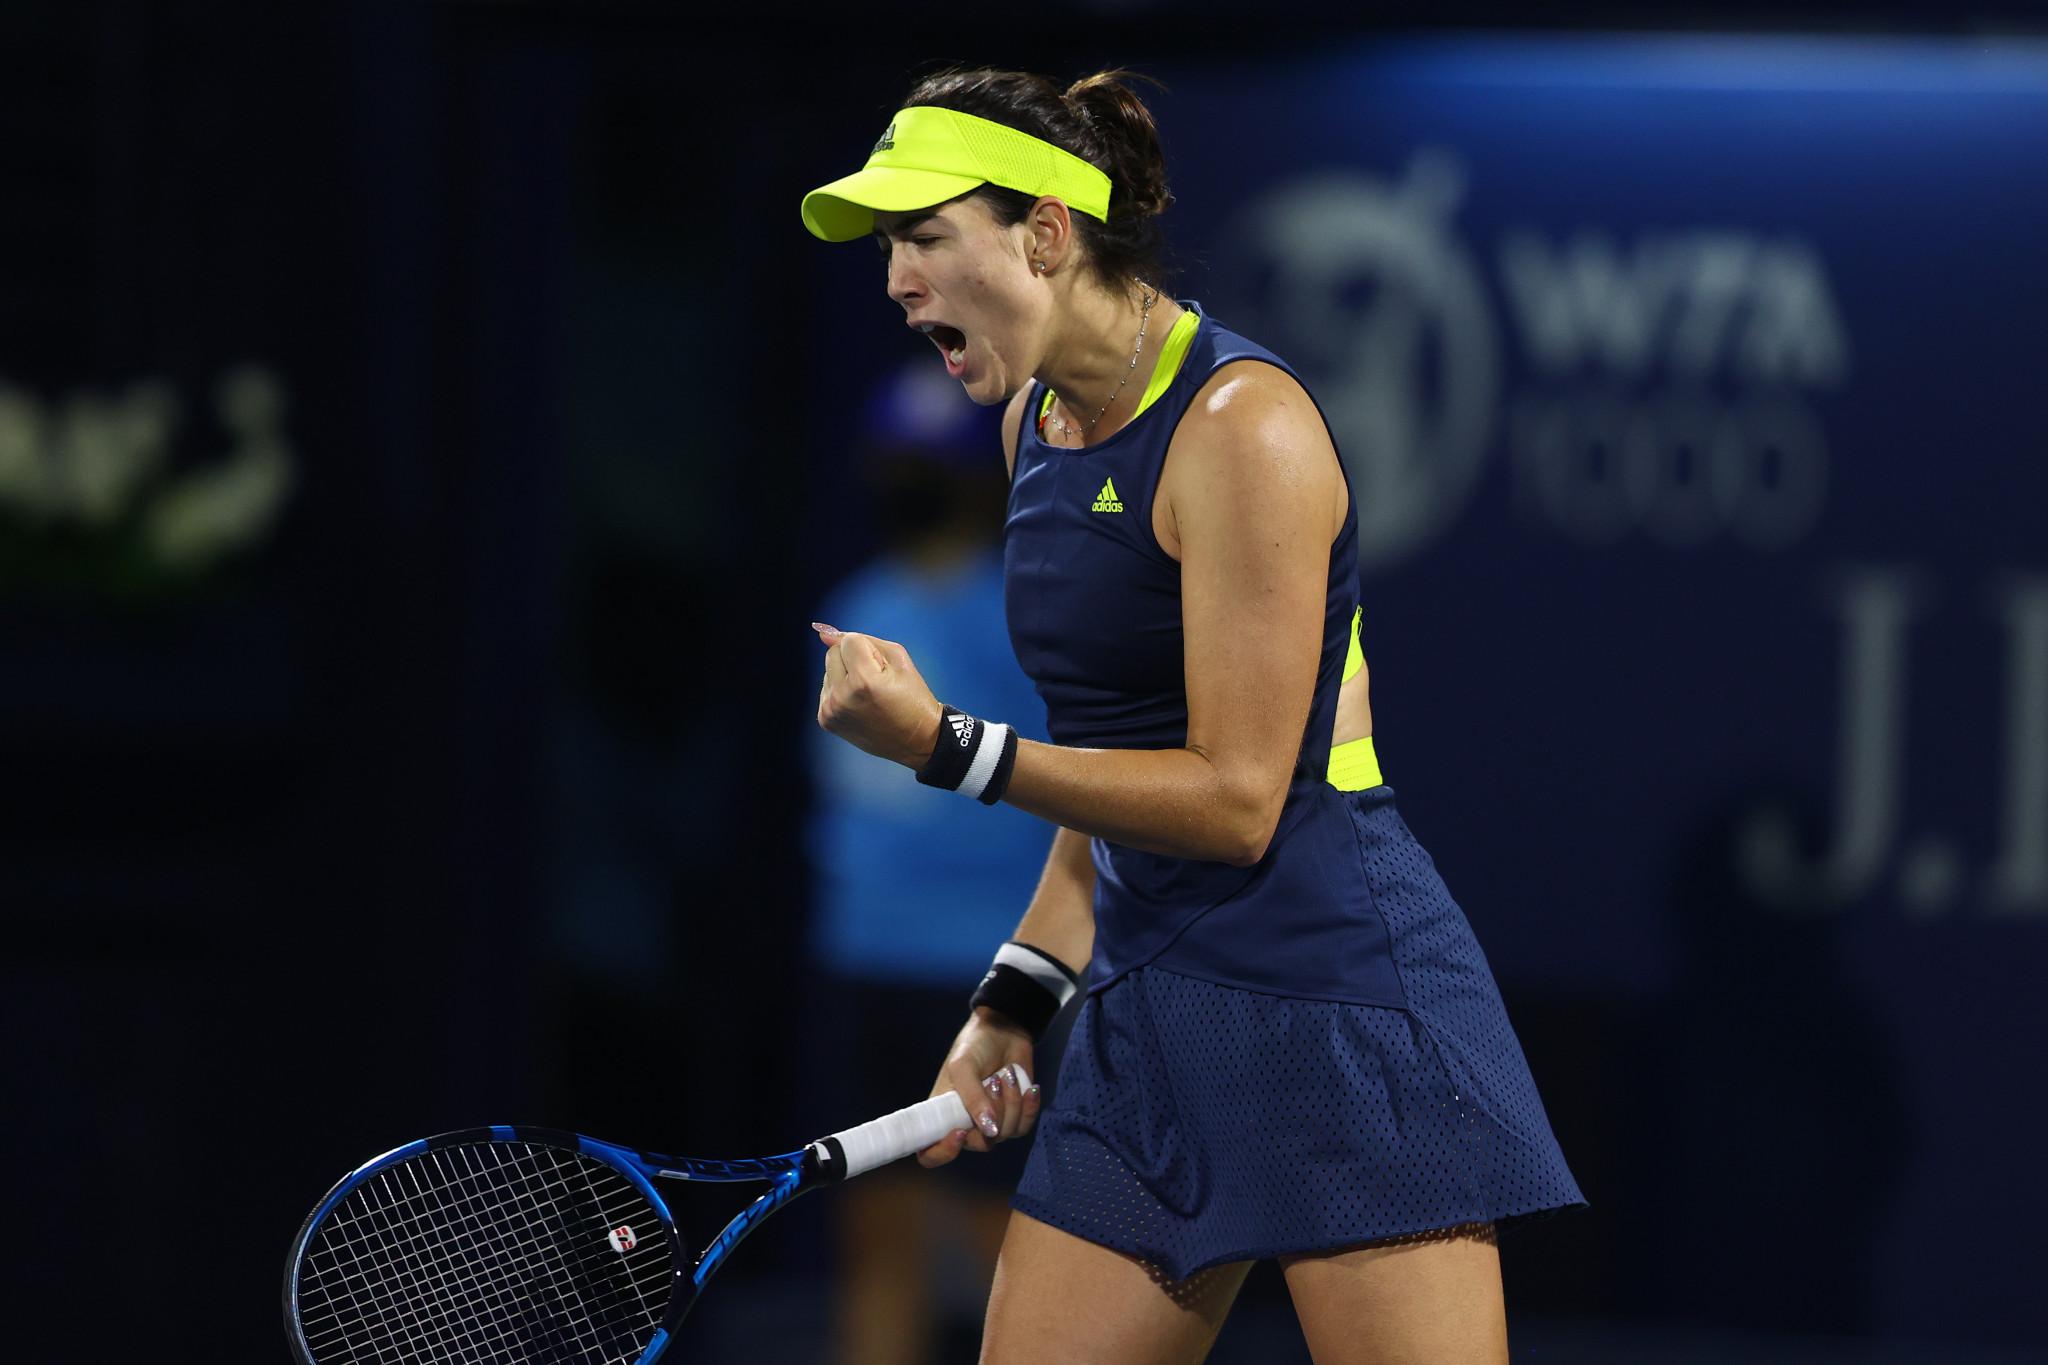 Muguruza and Mertens only remaining seeds at WTA Dubai Tennis Championships after three-set quarter-final wins